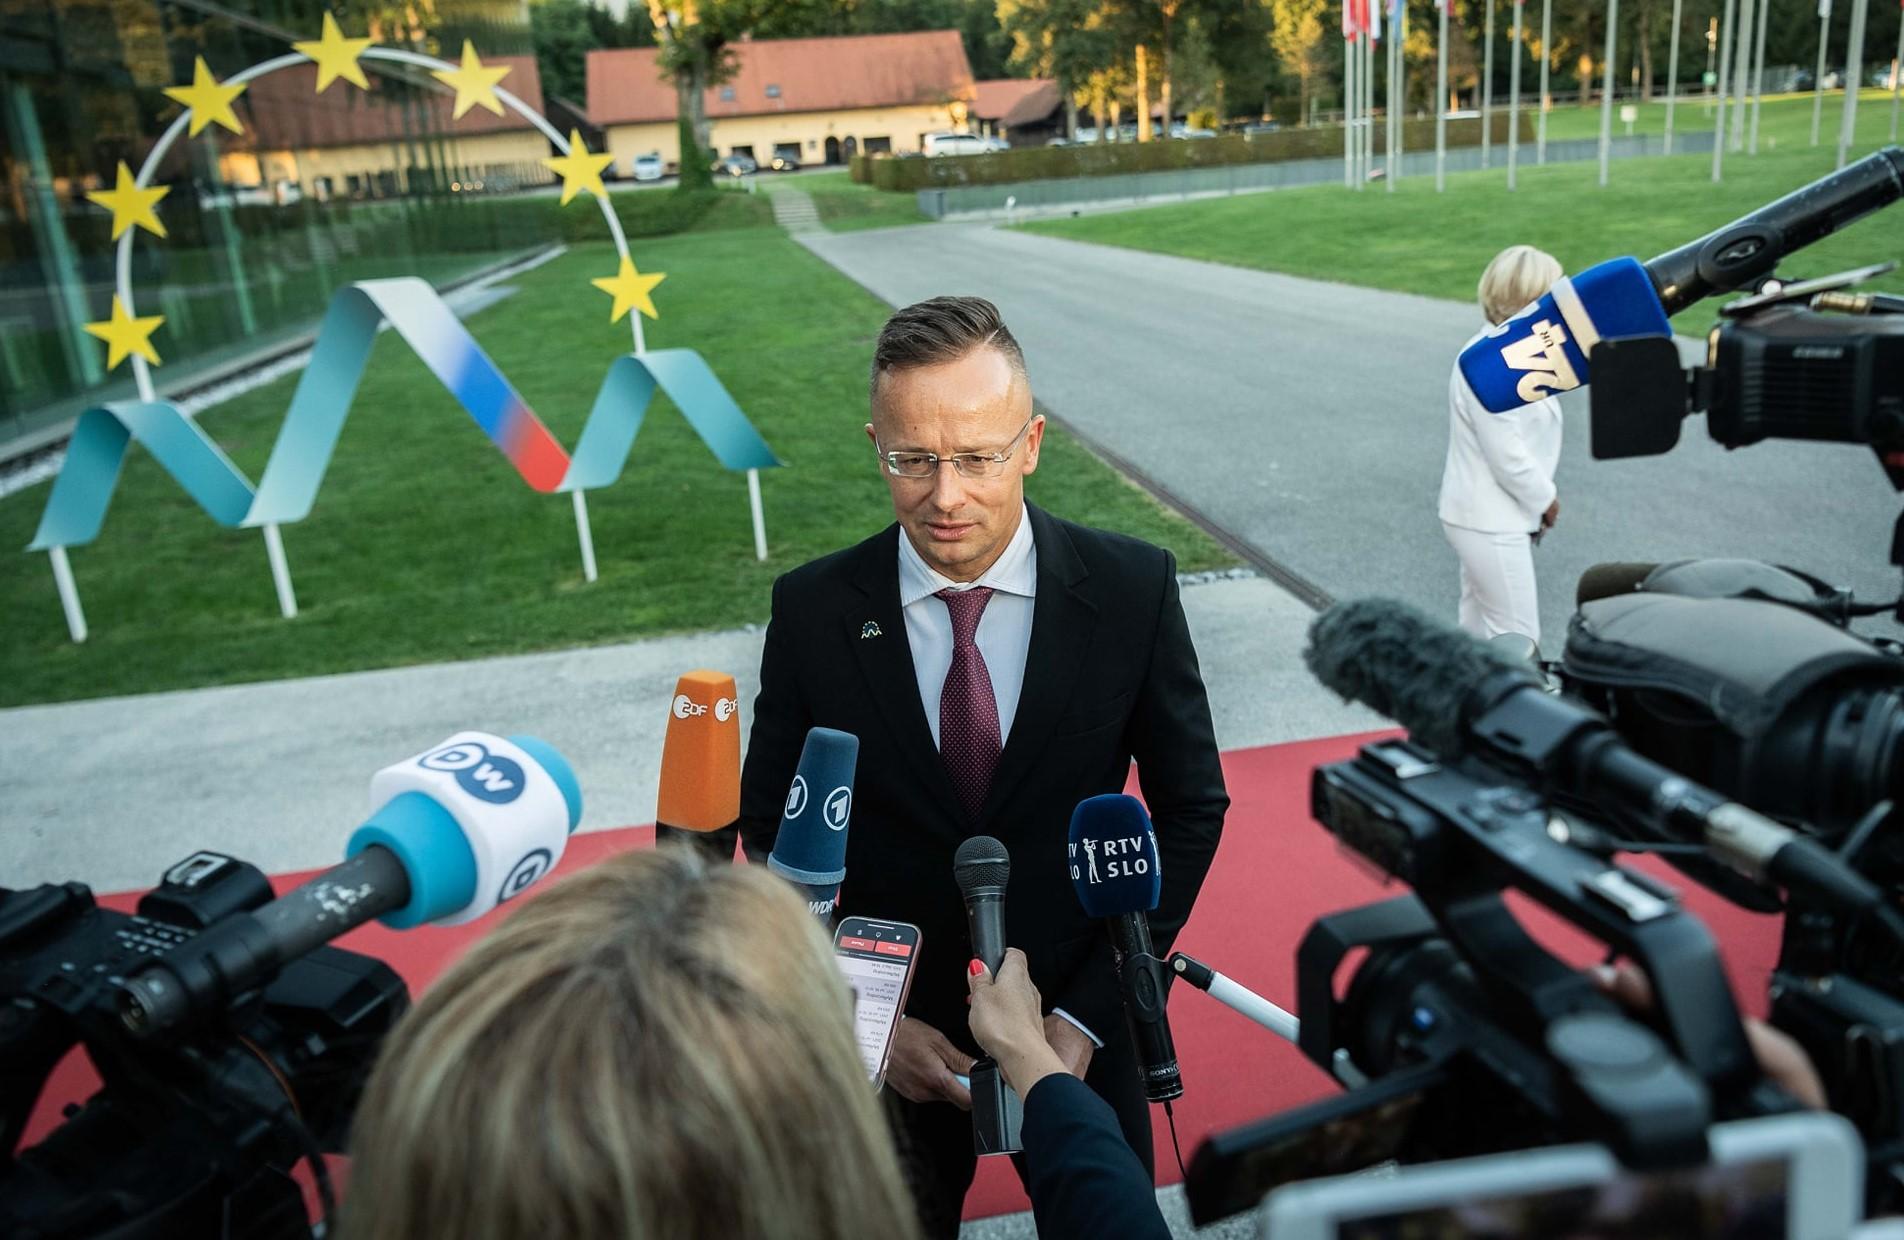 FM Szijjártó: EU 'Reverting to Failed 2015 Track' in Handling Afghanistan Situation